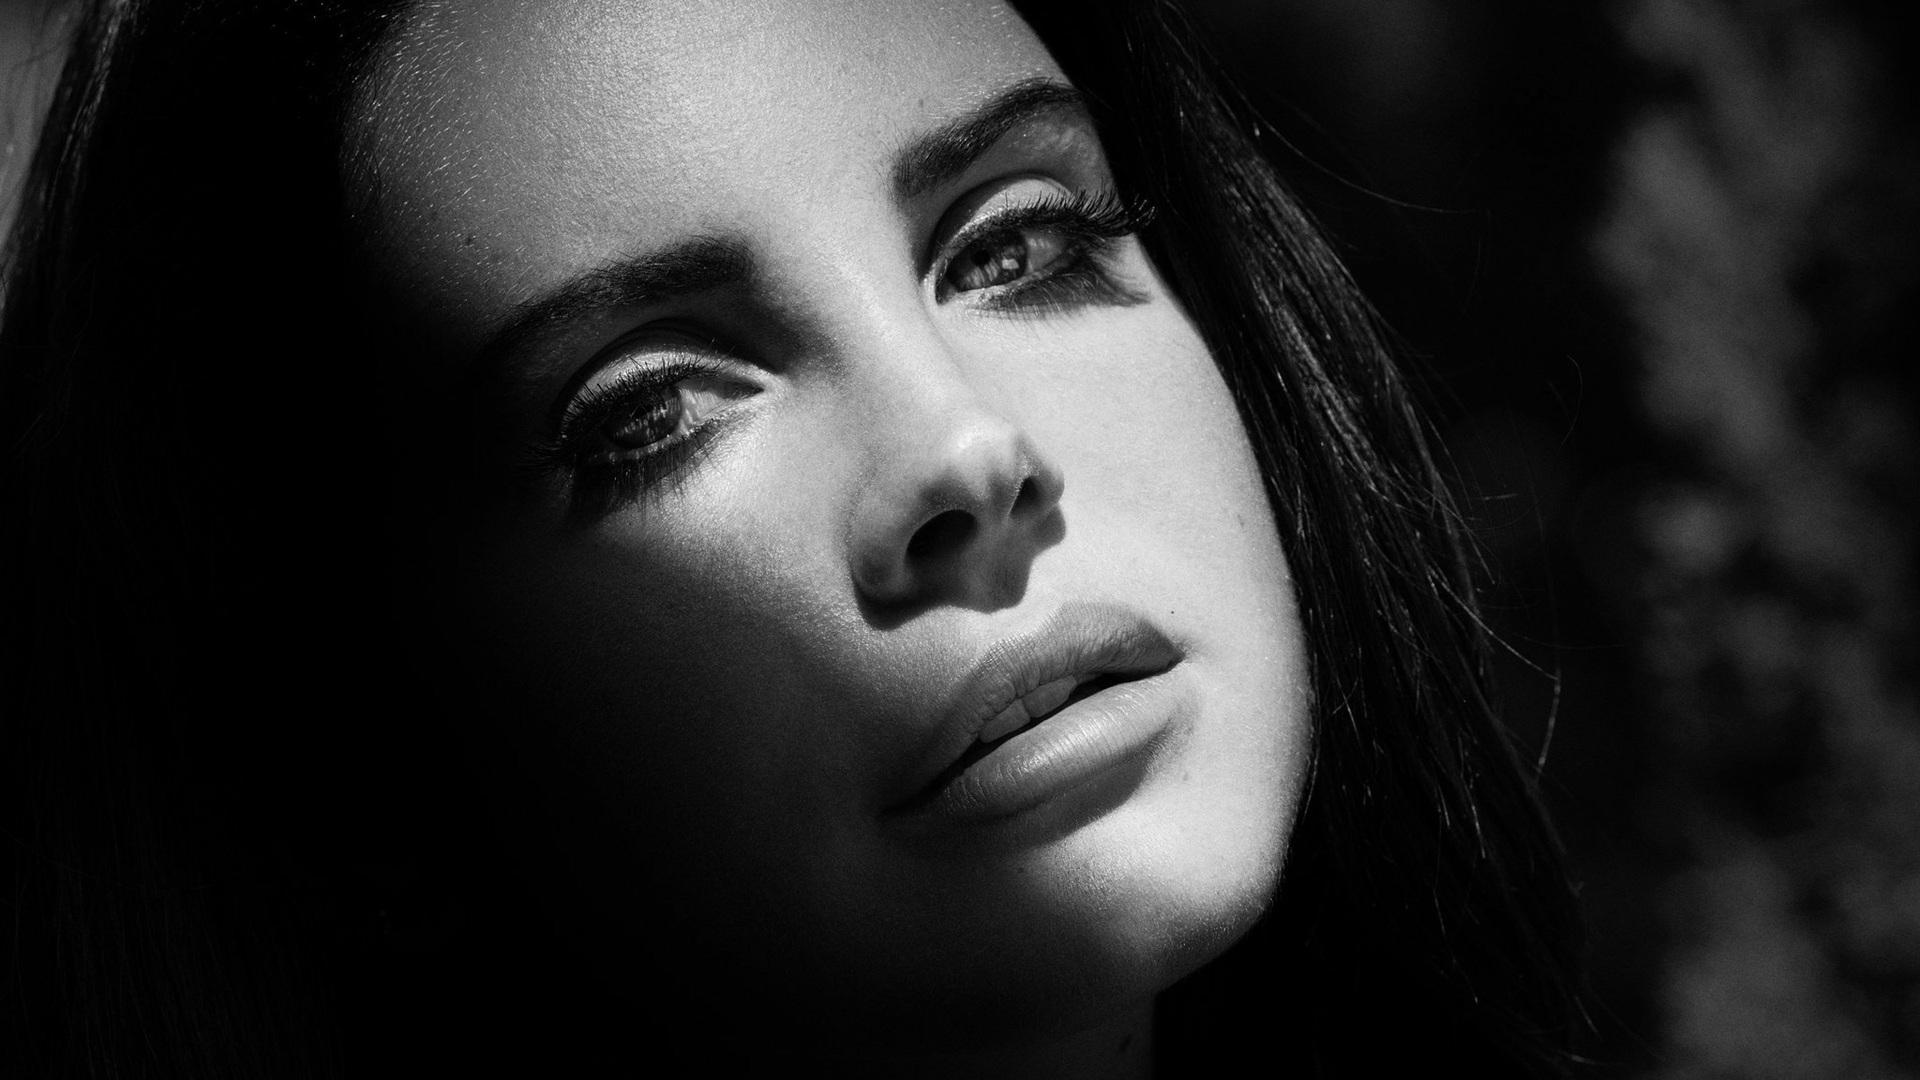 1920x1080 Lana Del Rey Monochrome Laptop Full HD 1080P HD ...